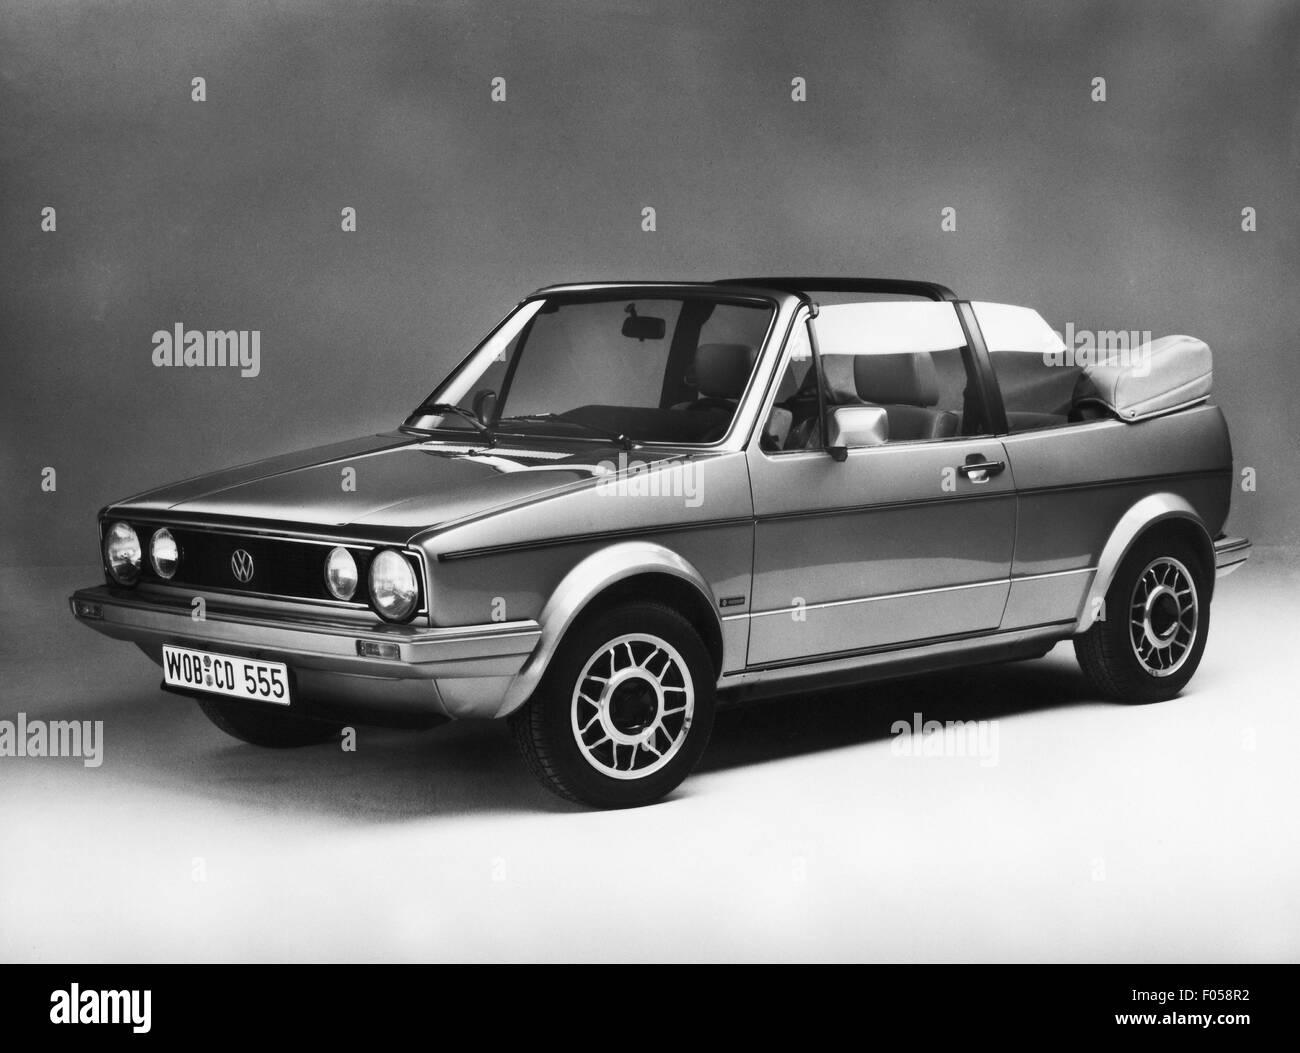 transport / transportation, car, vehicle variants, Volkswagen, VW Golf Mk2 convertible, 1980s, Additional-Rights - Stock Image